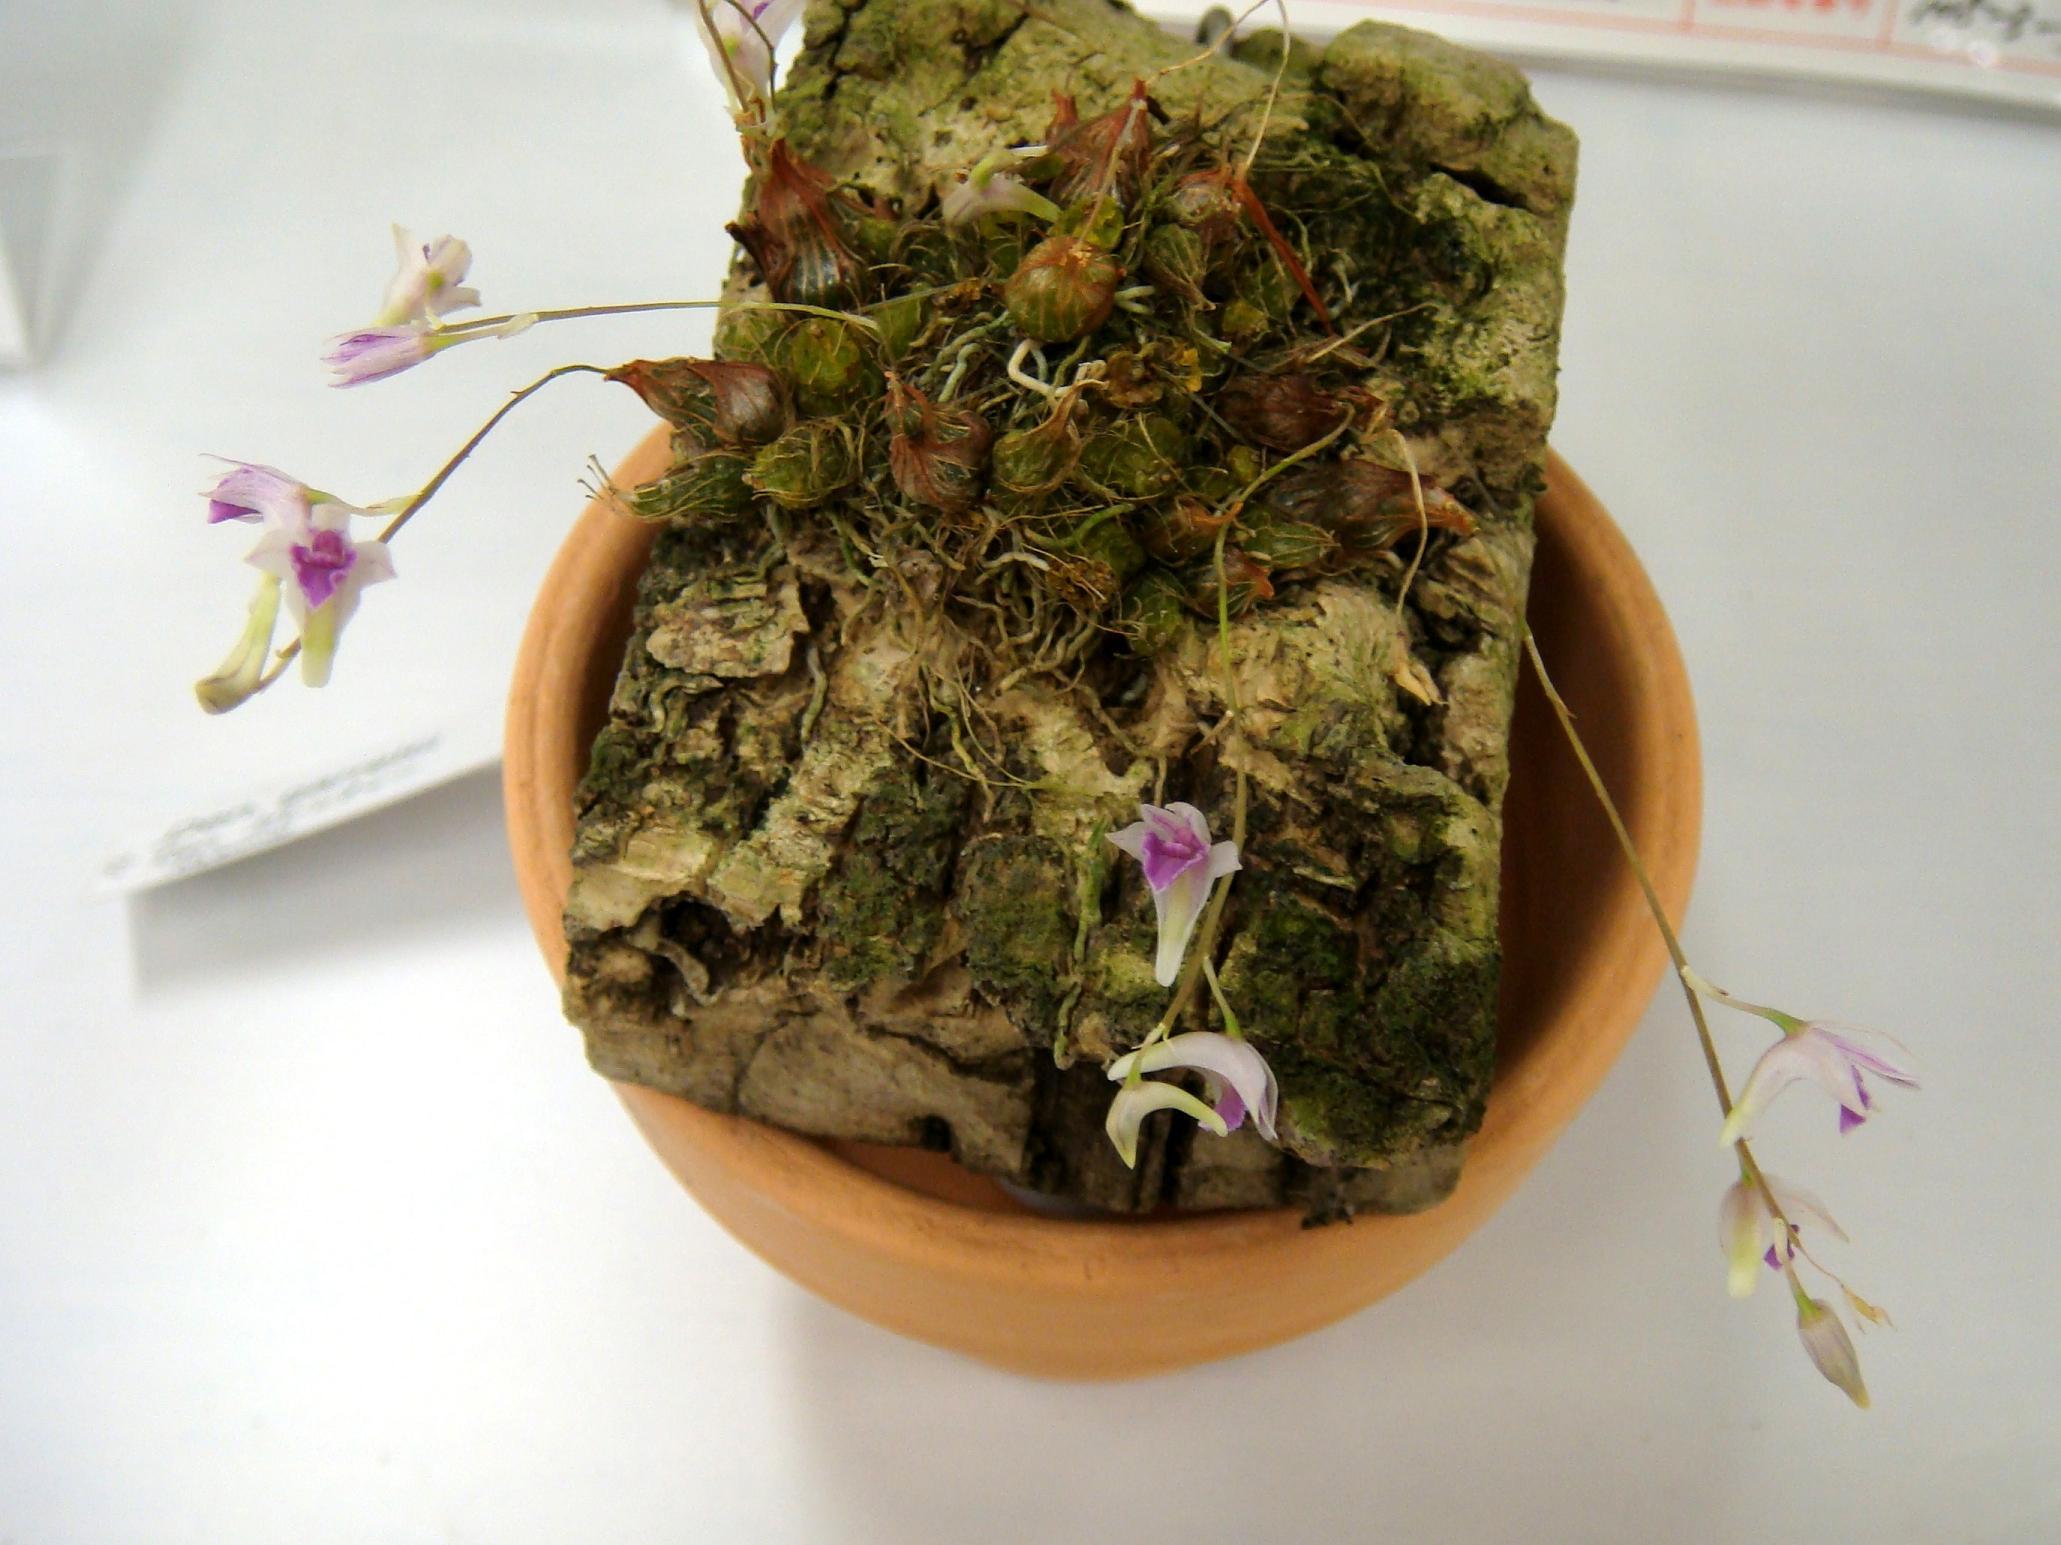 http://orchids.la.coocan.jp/Dendrobium/Dendrobium%20garrettii/DSC07175.JPG